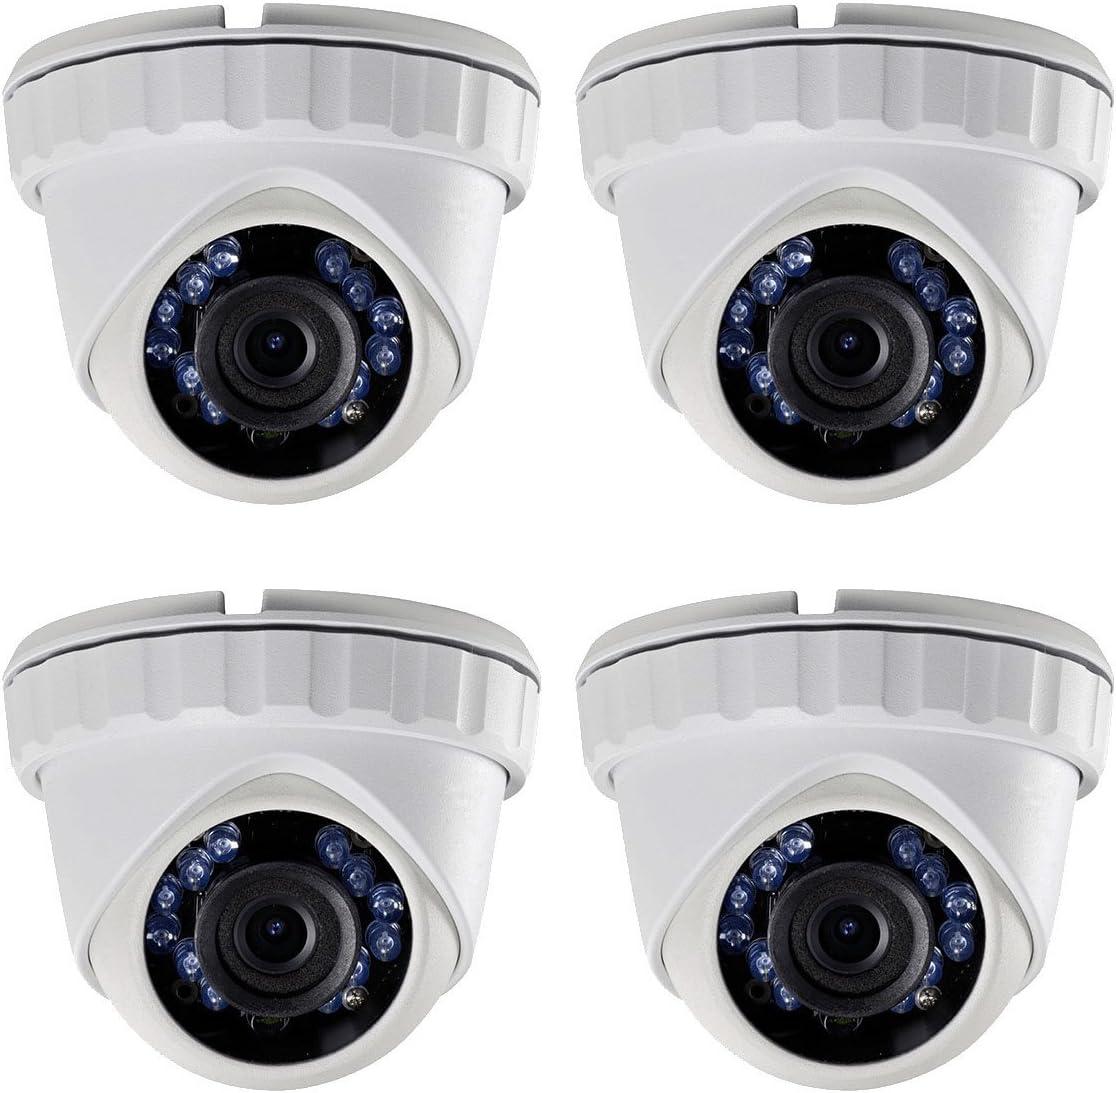 (4X) CMHT2122-28 HD-Tvi 2.1MP 1080P 2.8mm Smart IR LED 65ft Security Camera